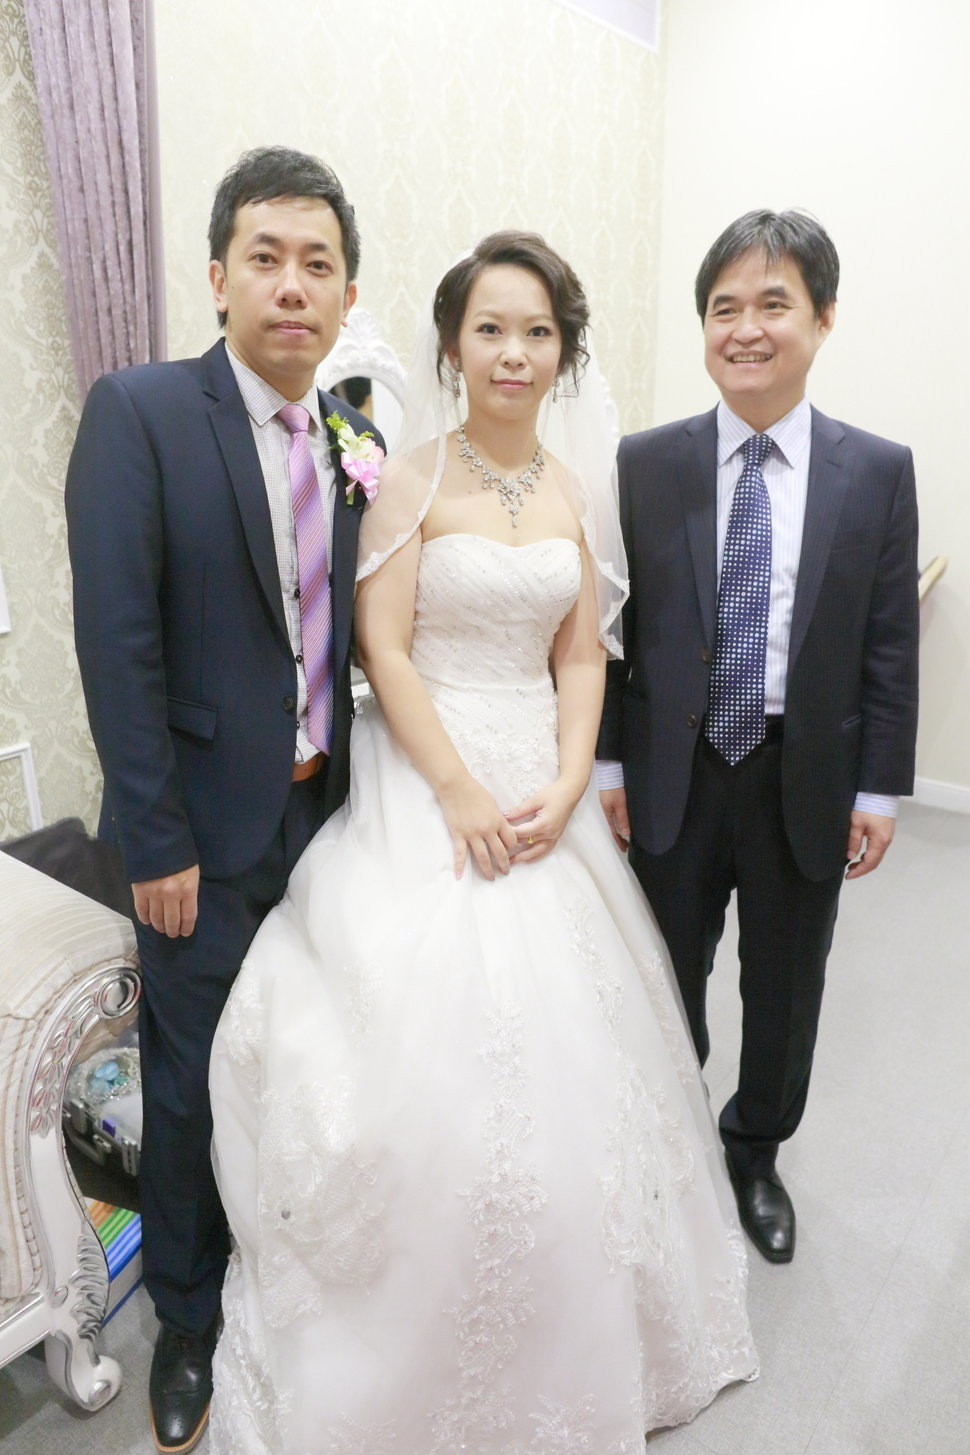 2016-01-17-12-03-09-0002_24122522449_o - 小COW婚禮紀錄 - 結婚吧